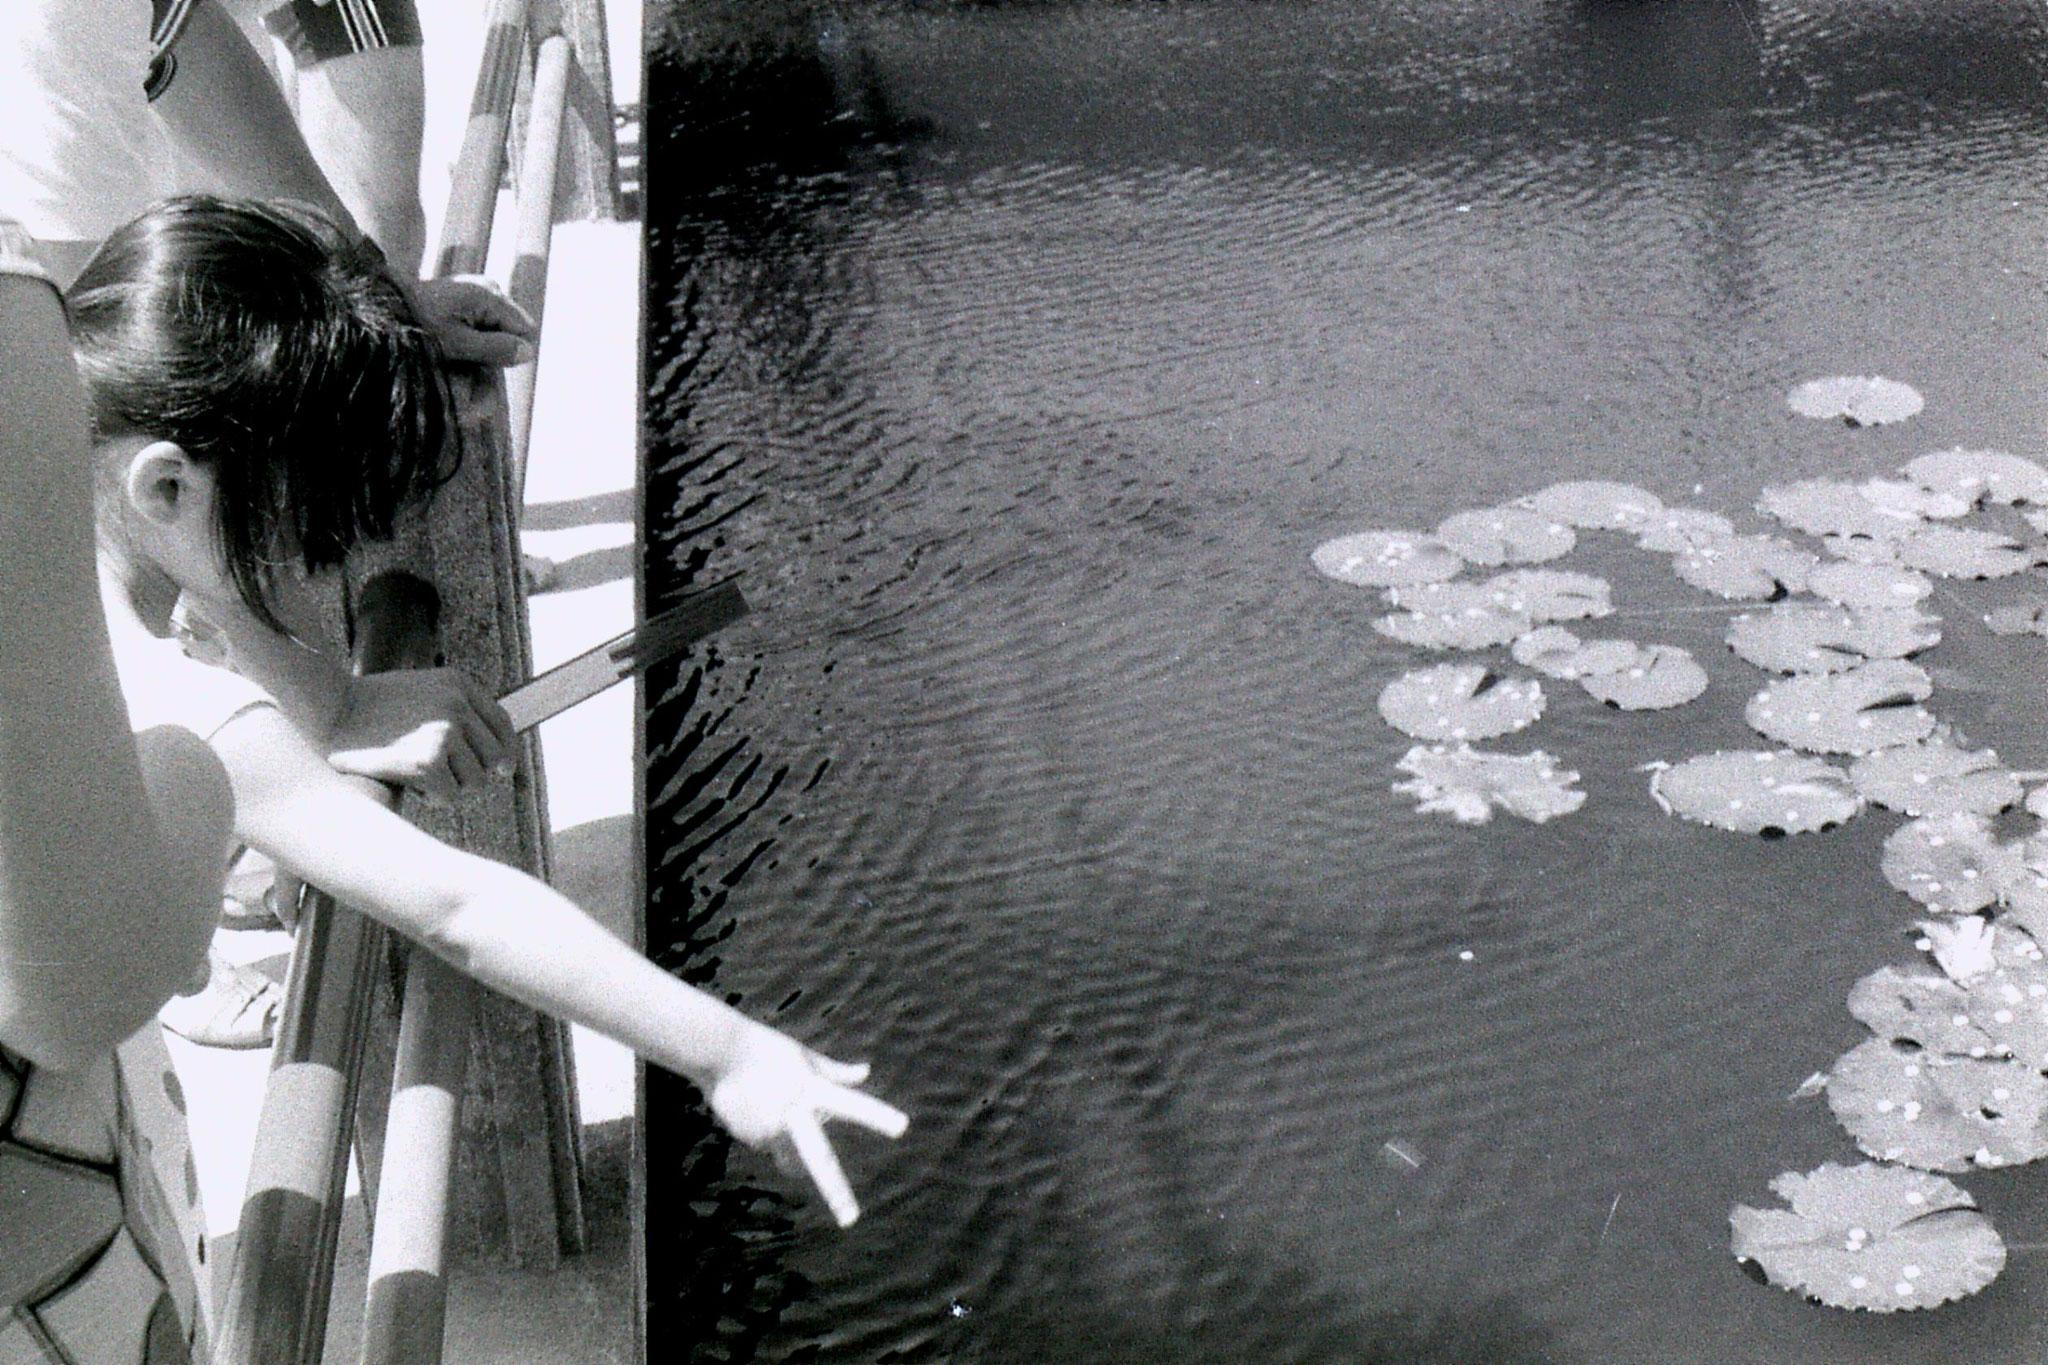 16/7/1989: 8: